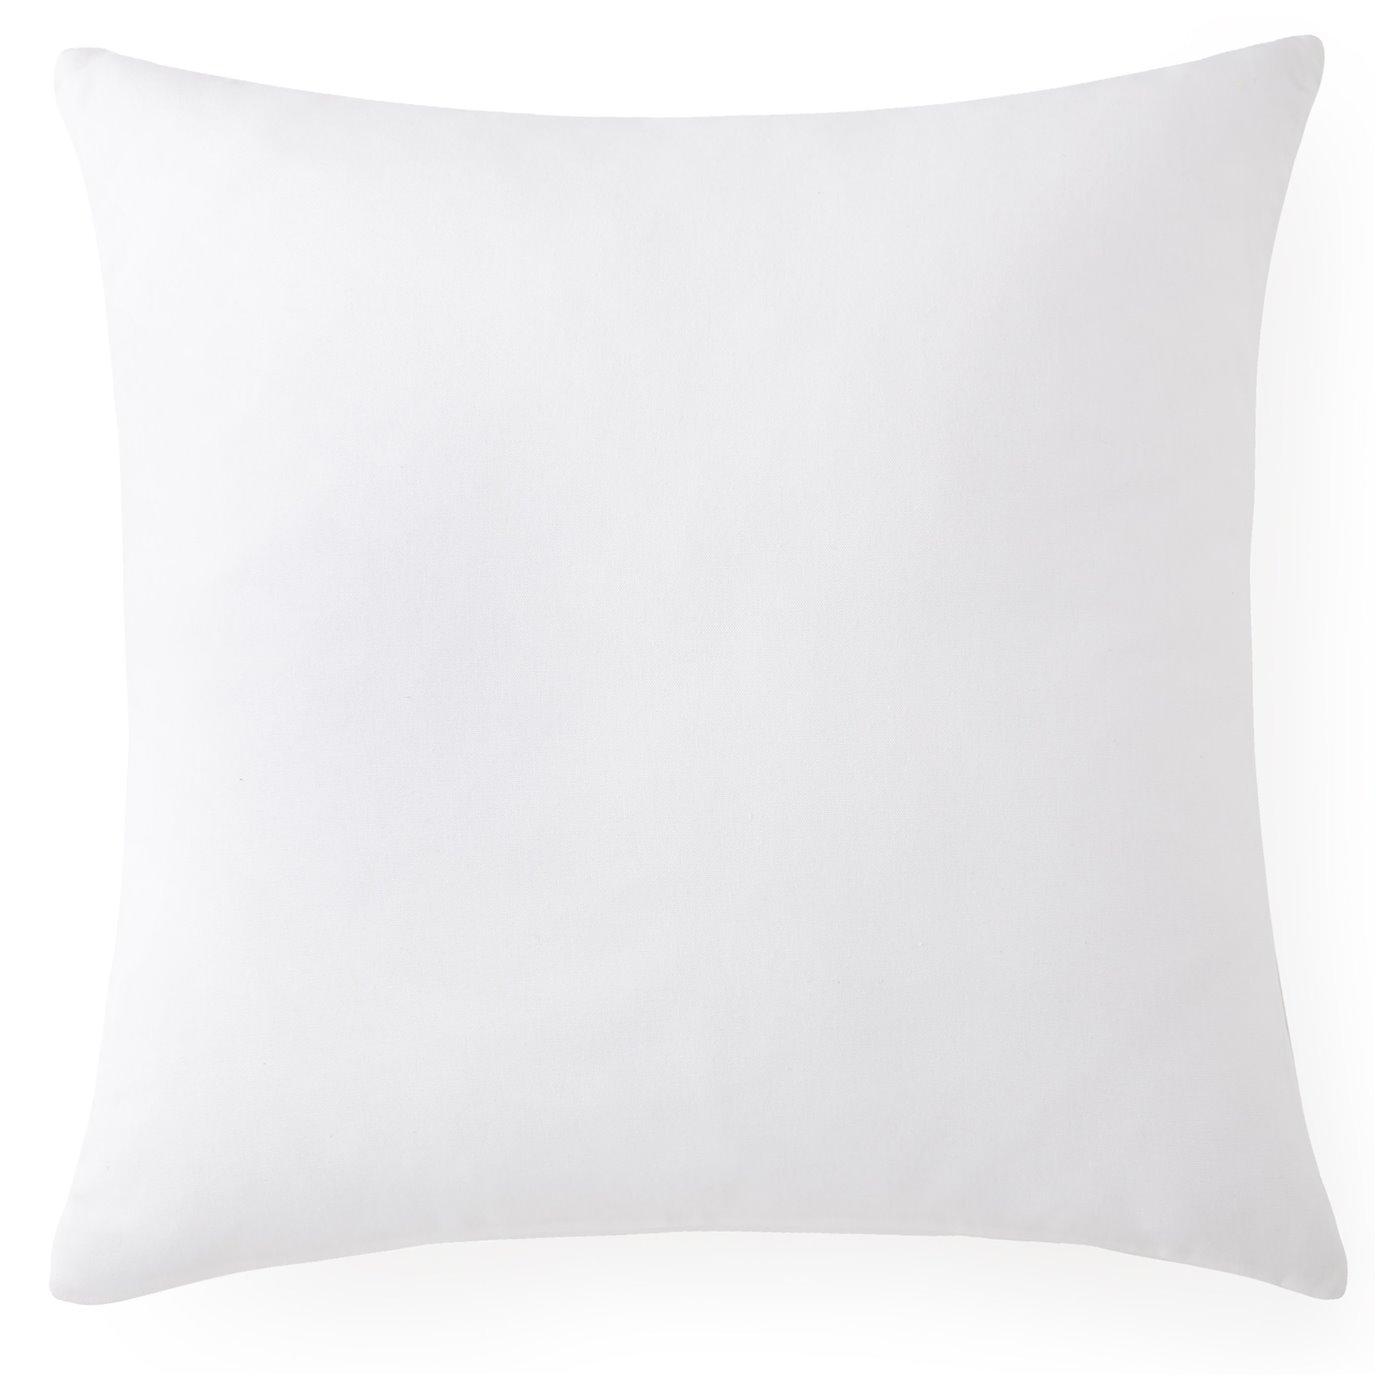 "Seascape Square Cushion 18""x18""- Solid White"